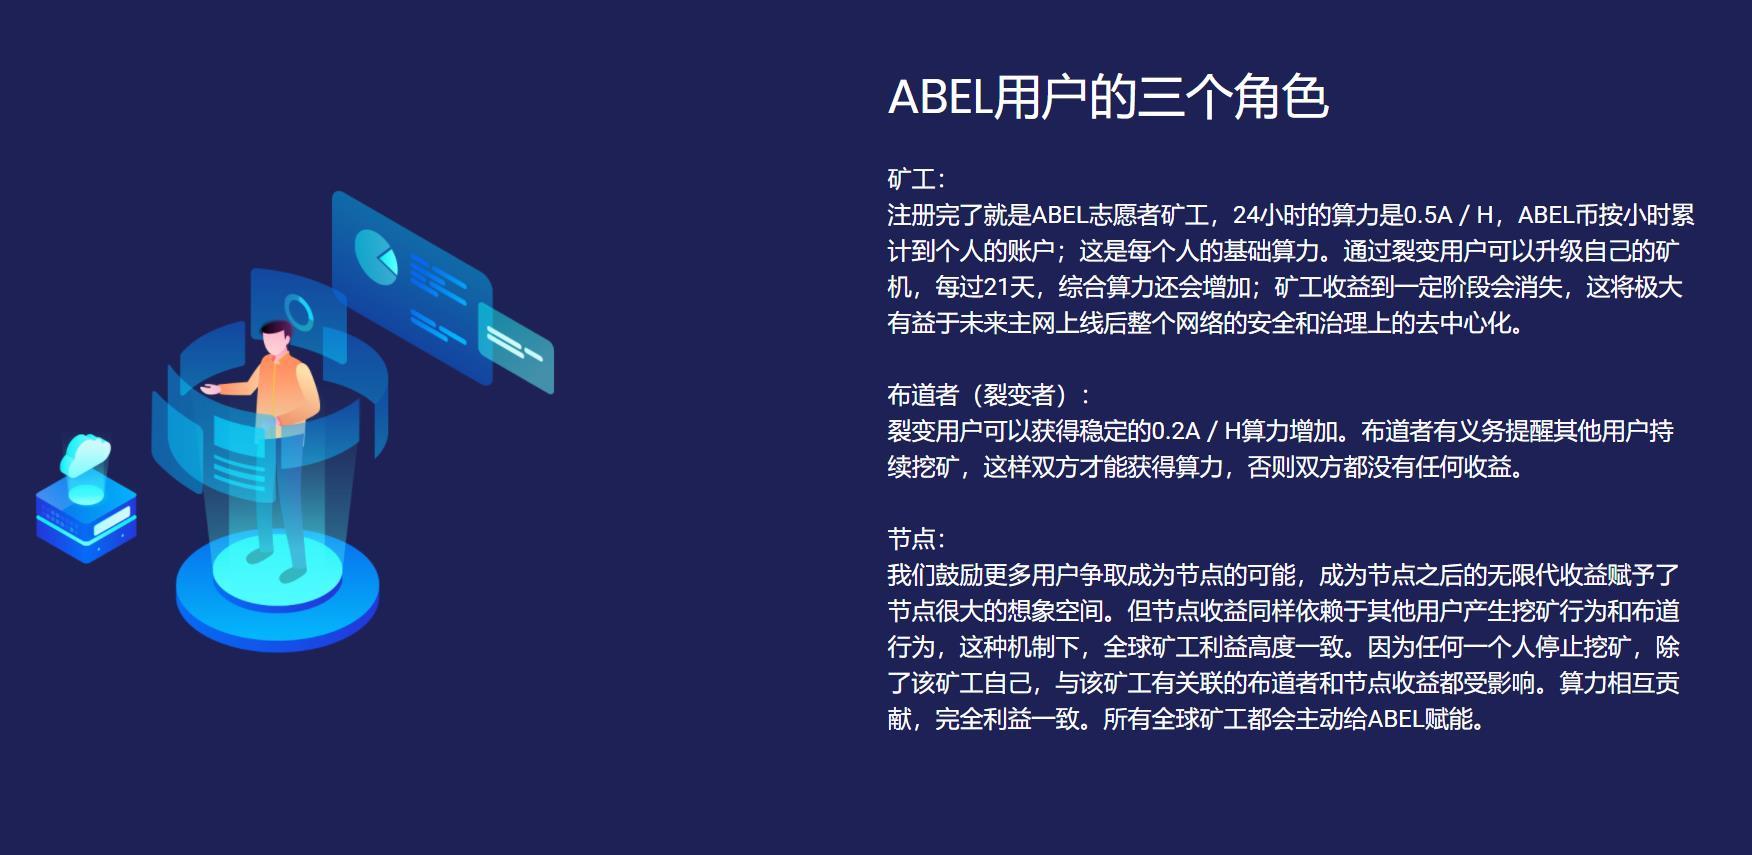 ABEL用户的三个角色